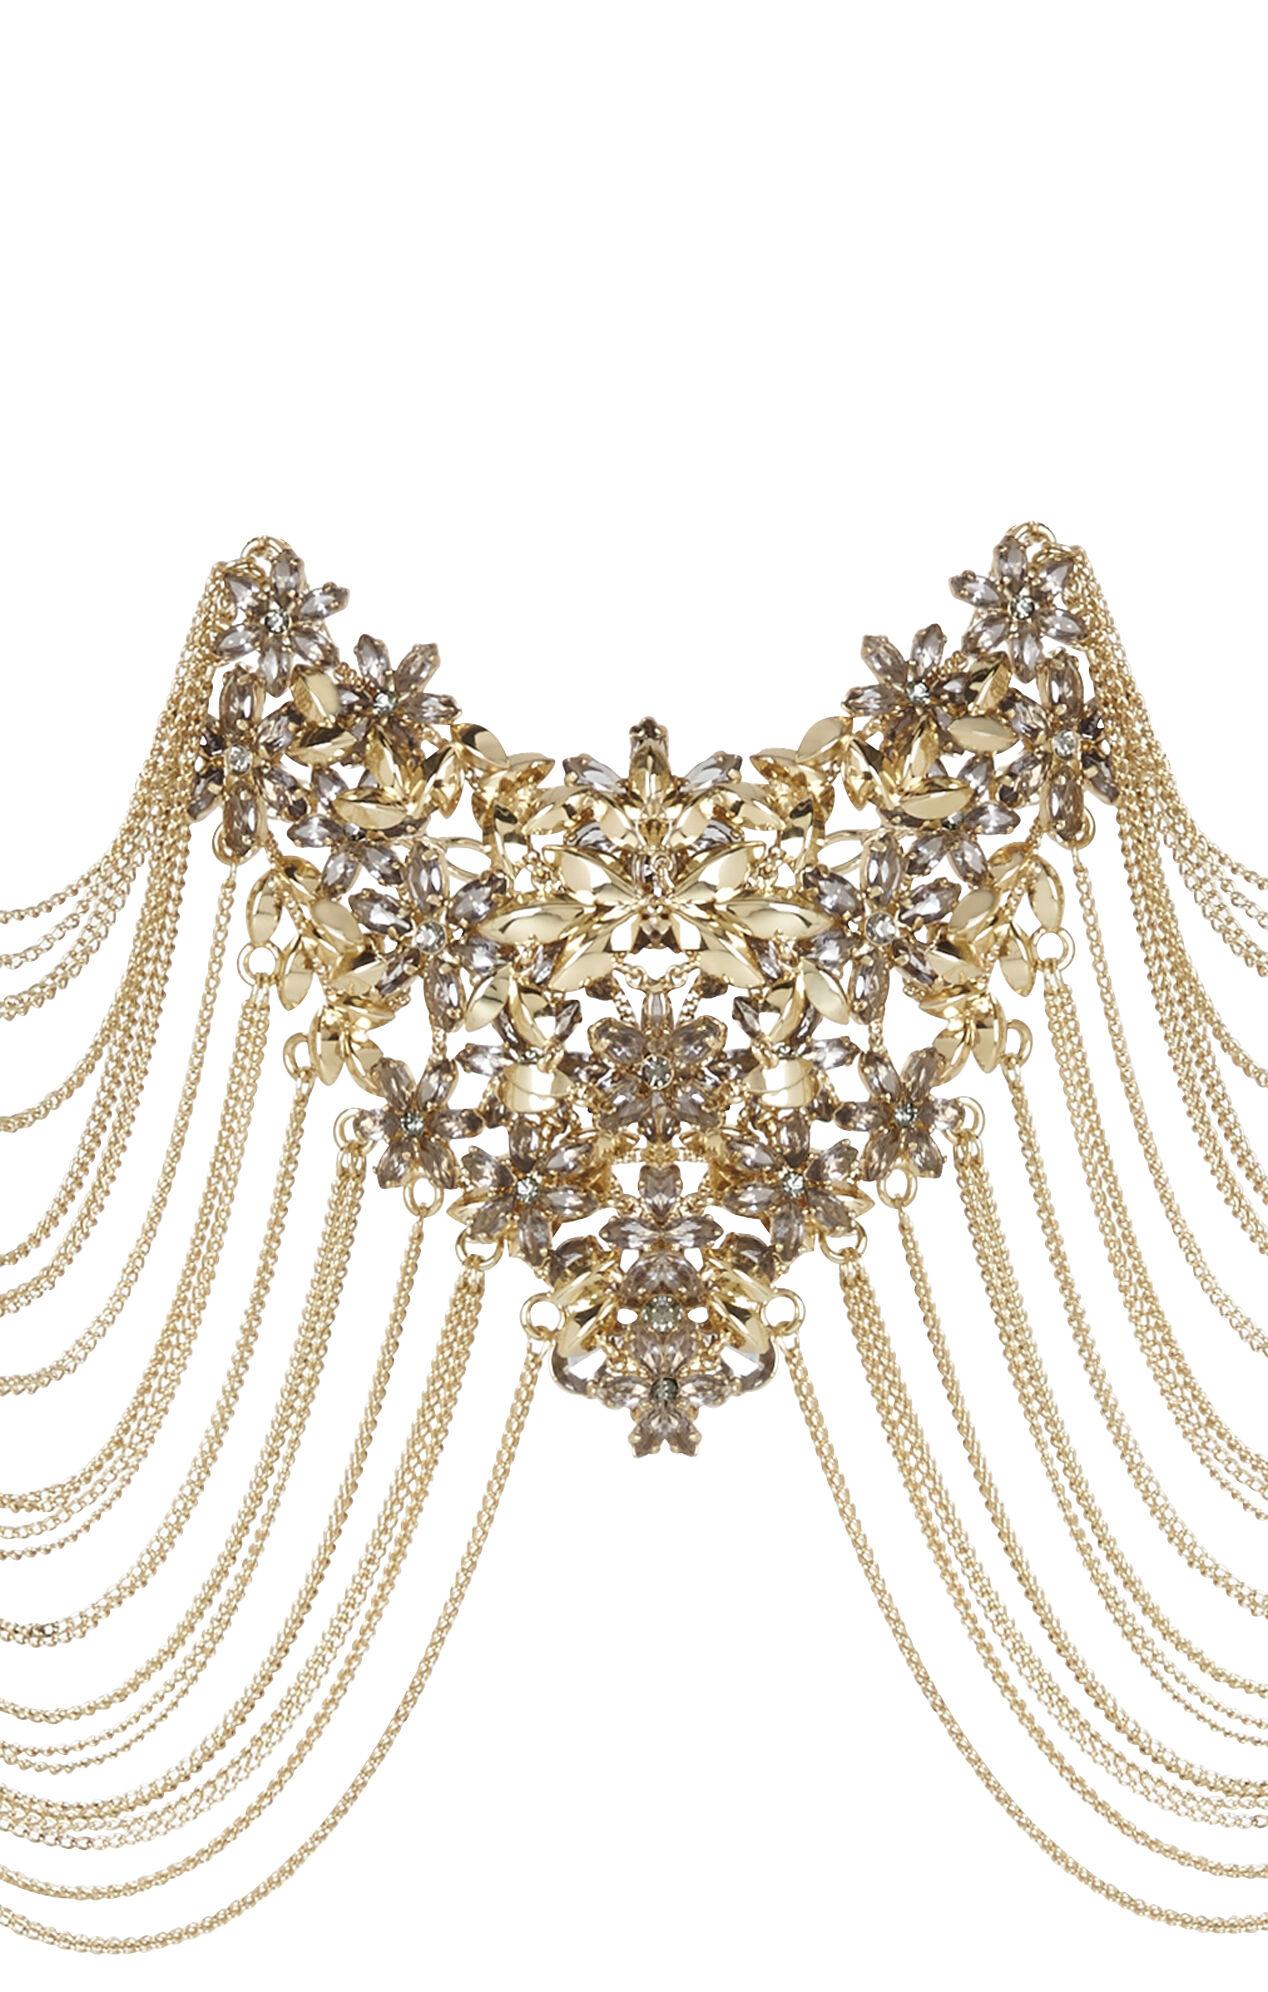 Floral-Epaulette Chain Bodypiece